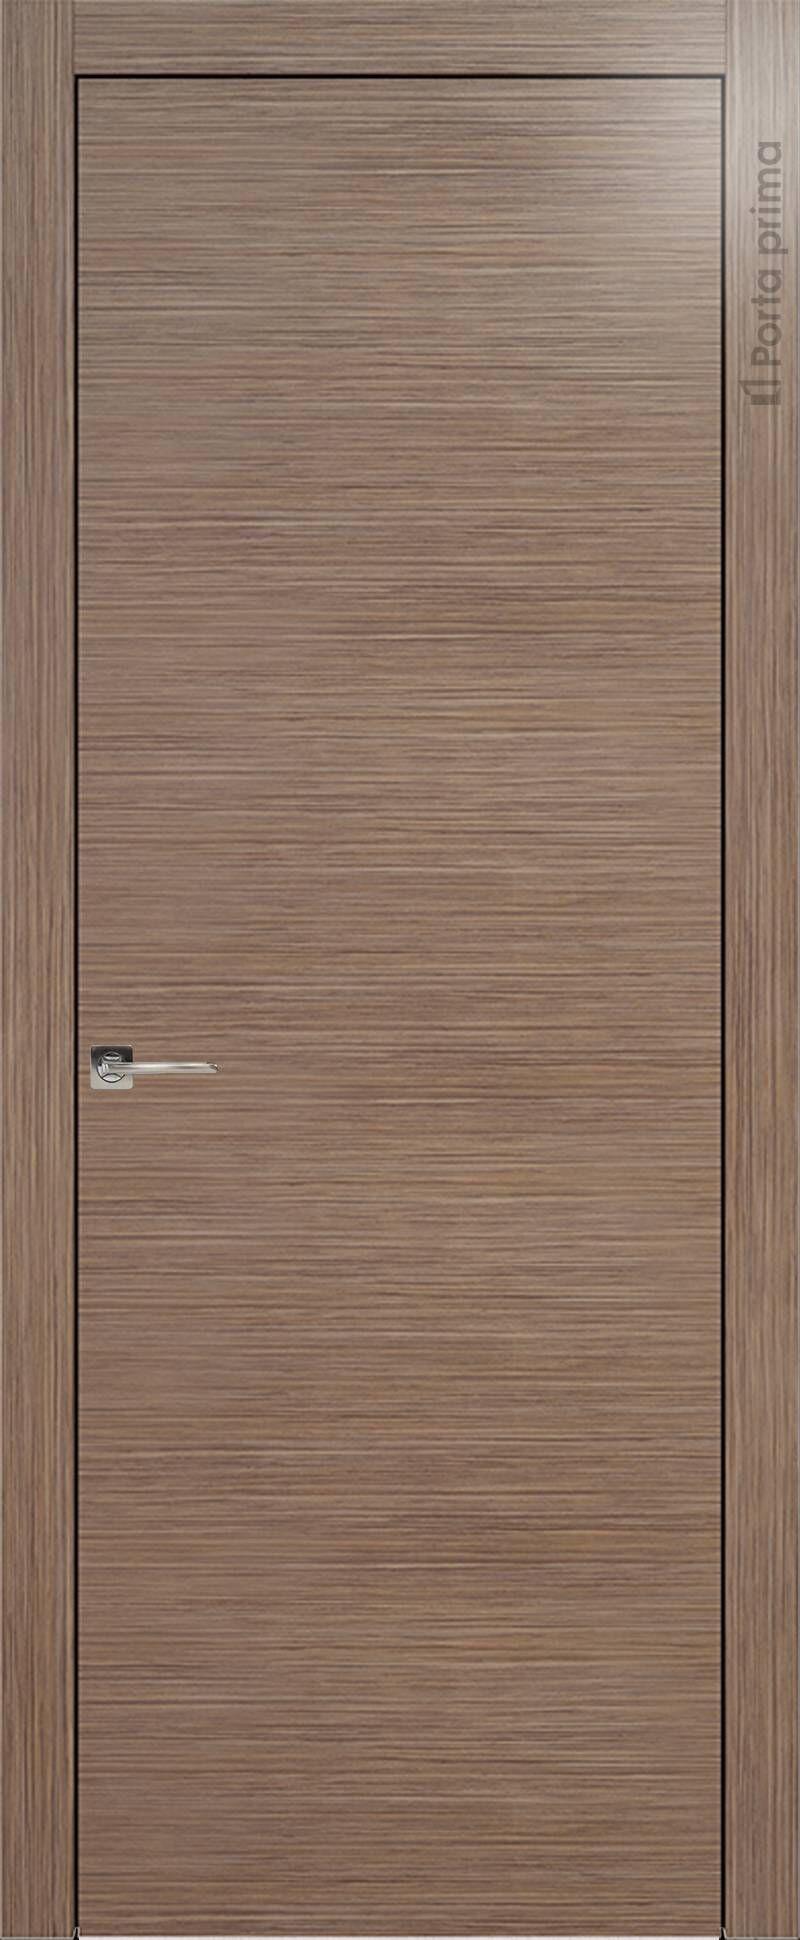 Tivoli А-2 цвет - Орех Без стекла (ДГ)